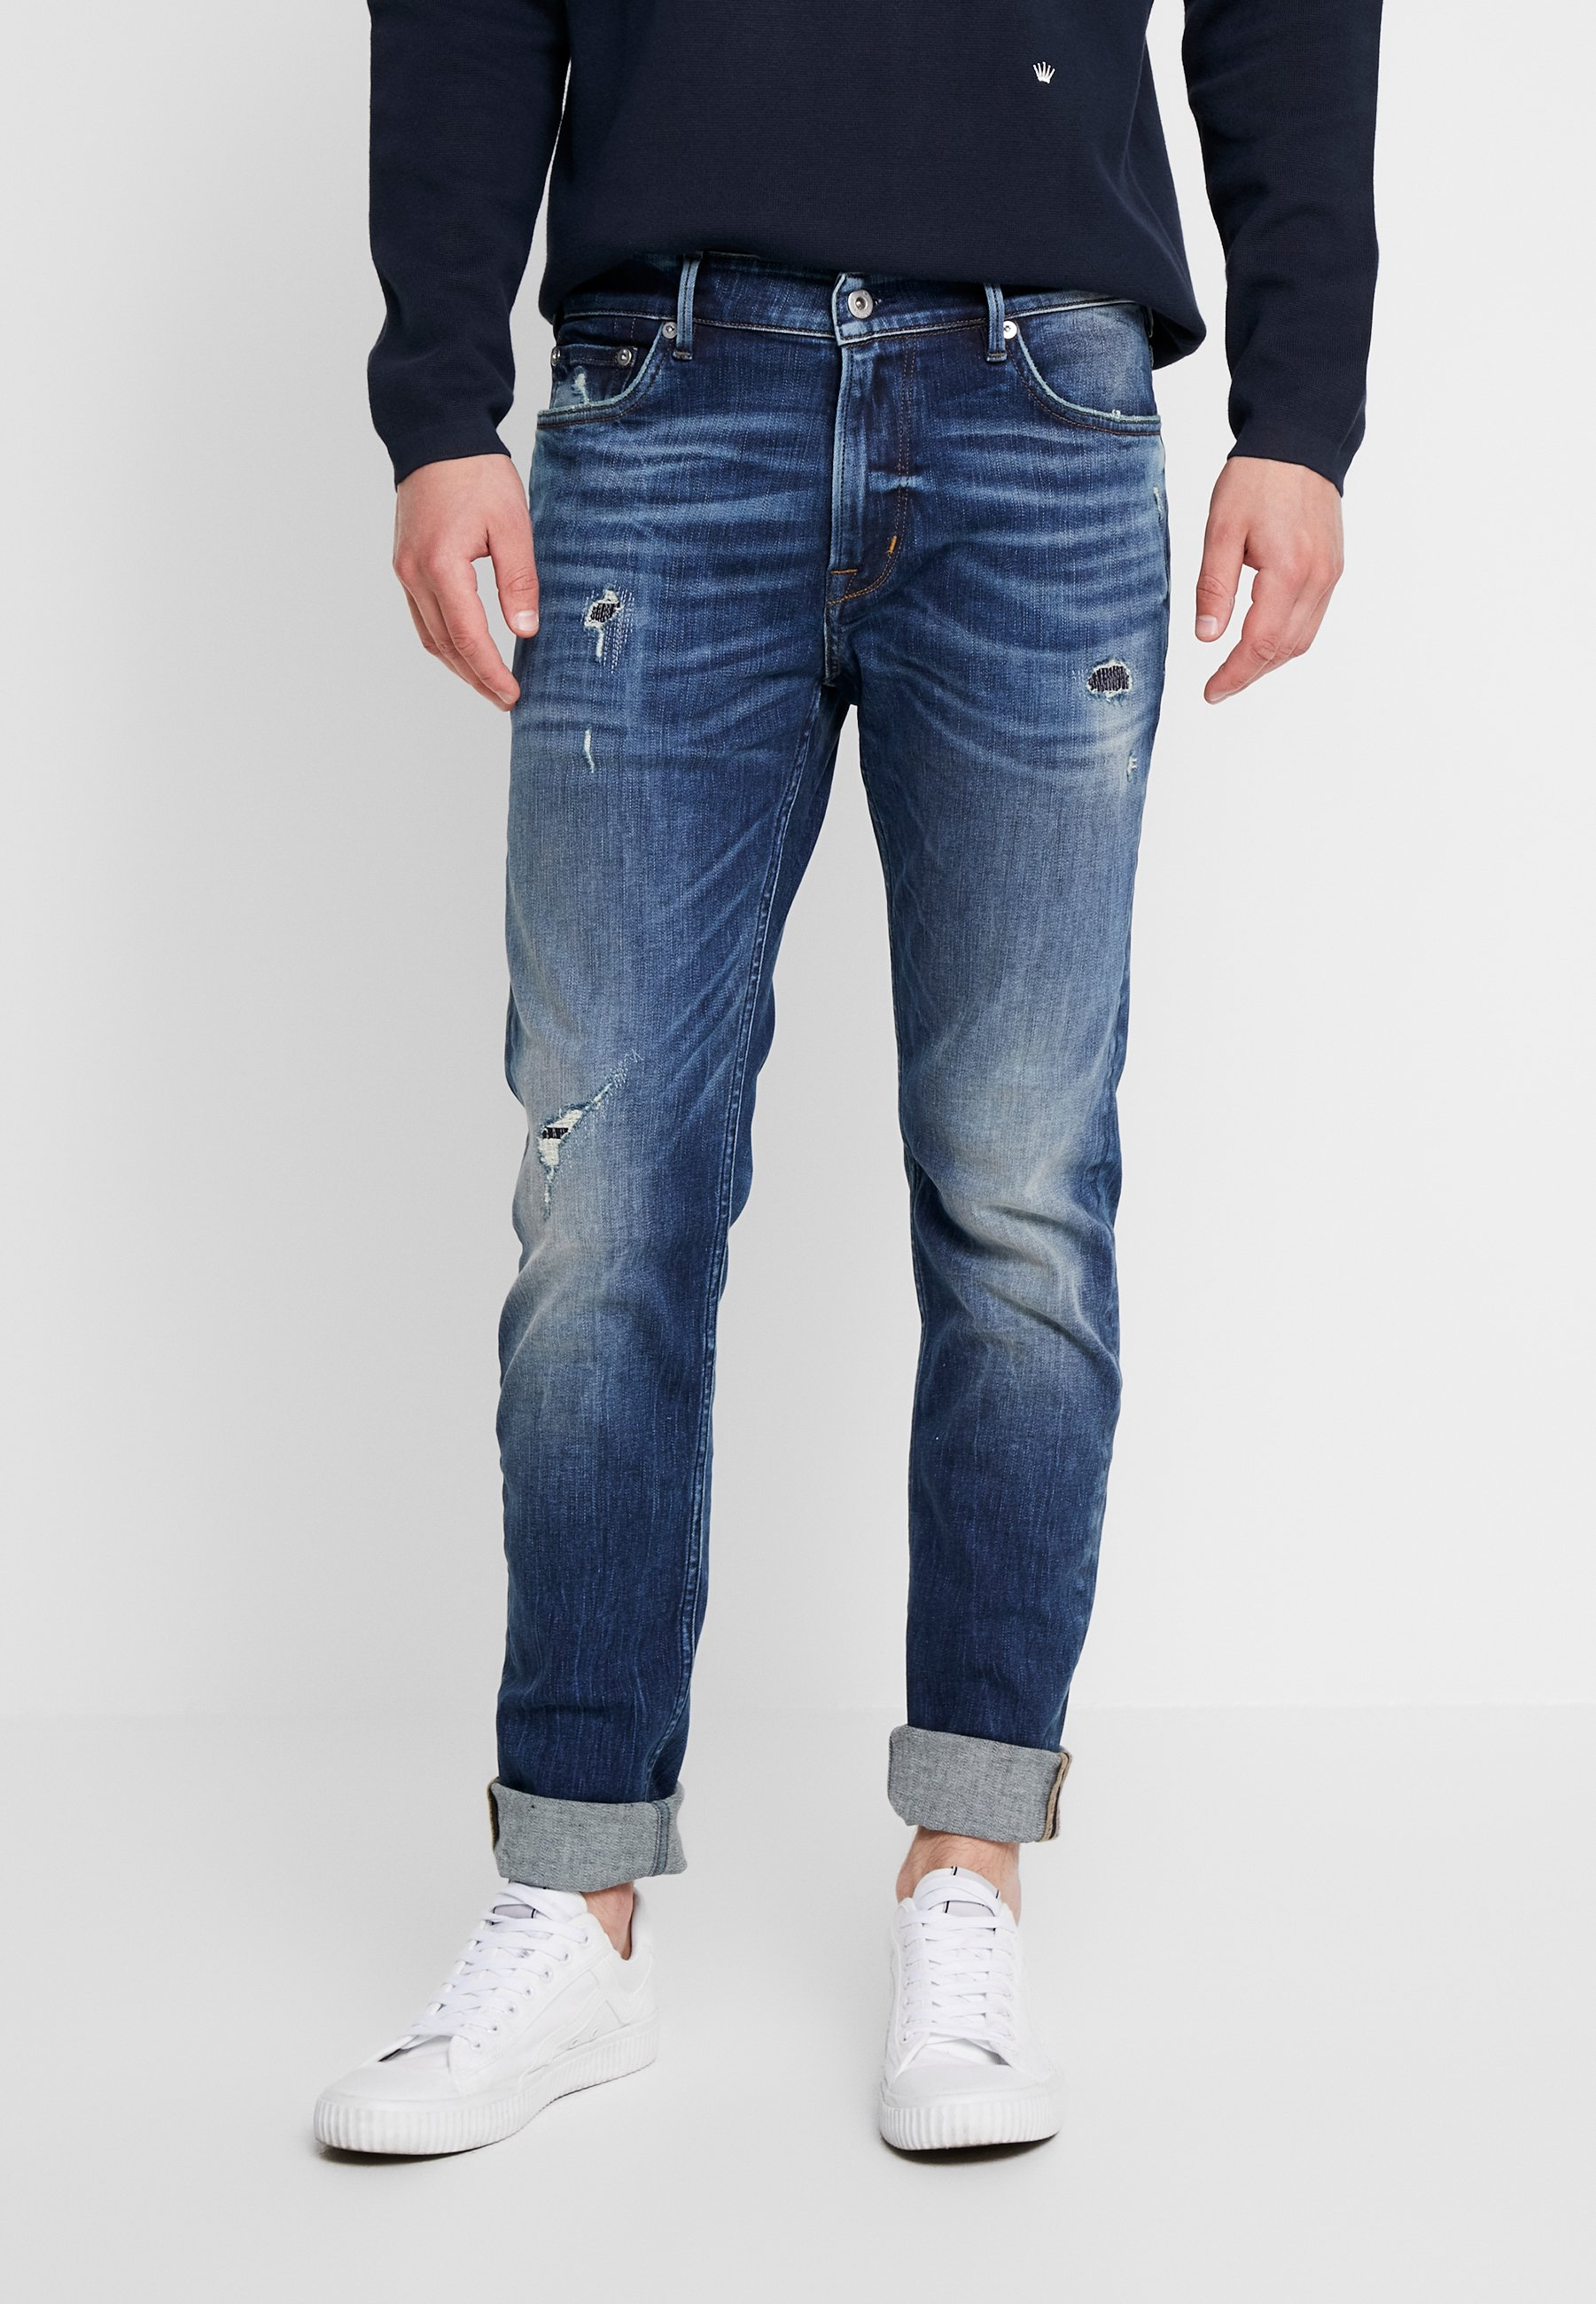 Junk Junk Luxe Indigo Junk SkinnyJeans Luxe SkinnyJeans De Indigo De E92YWHDI